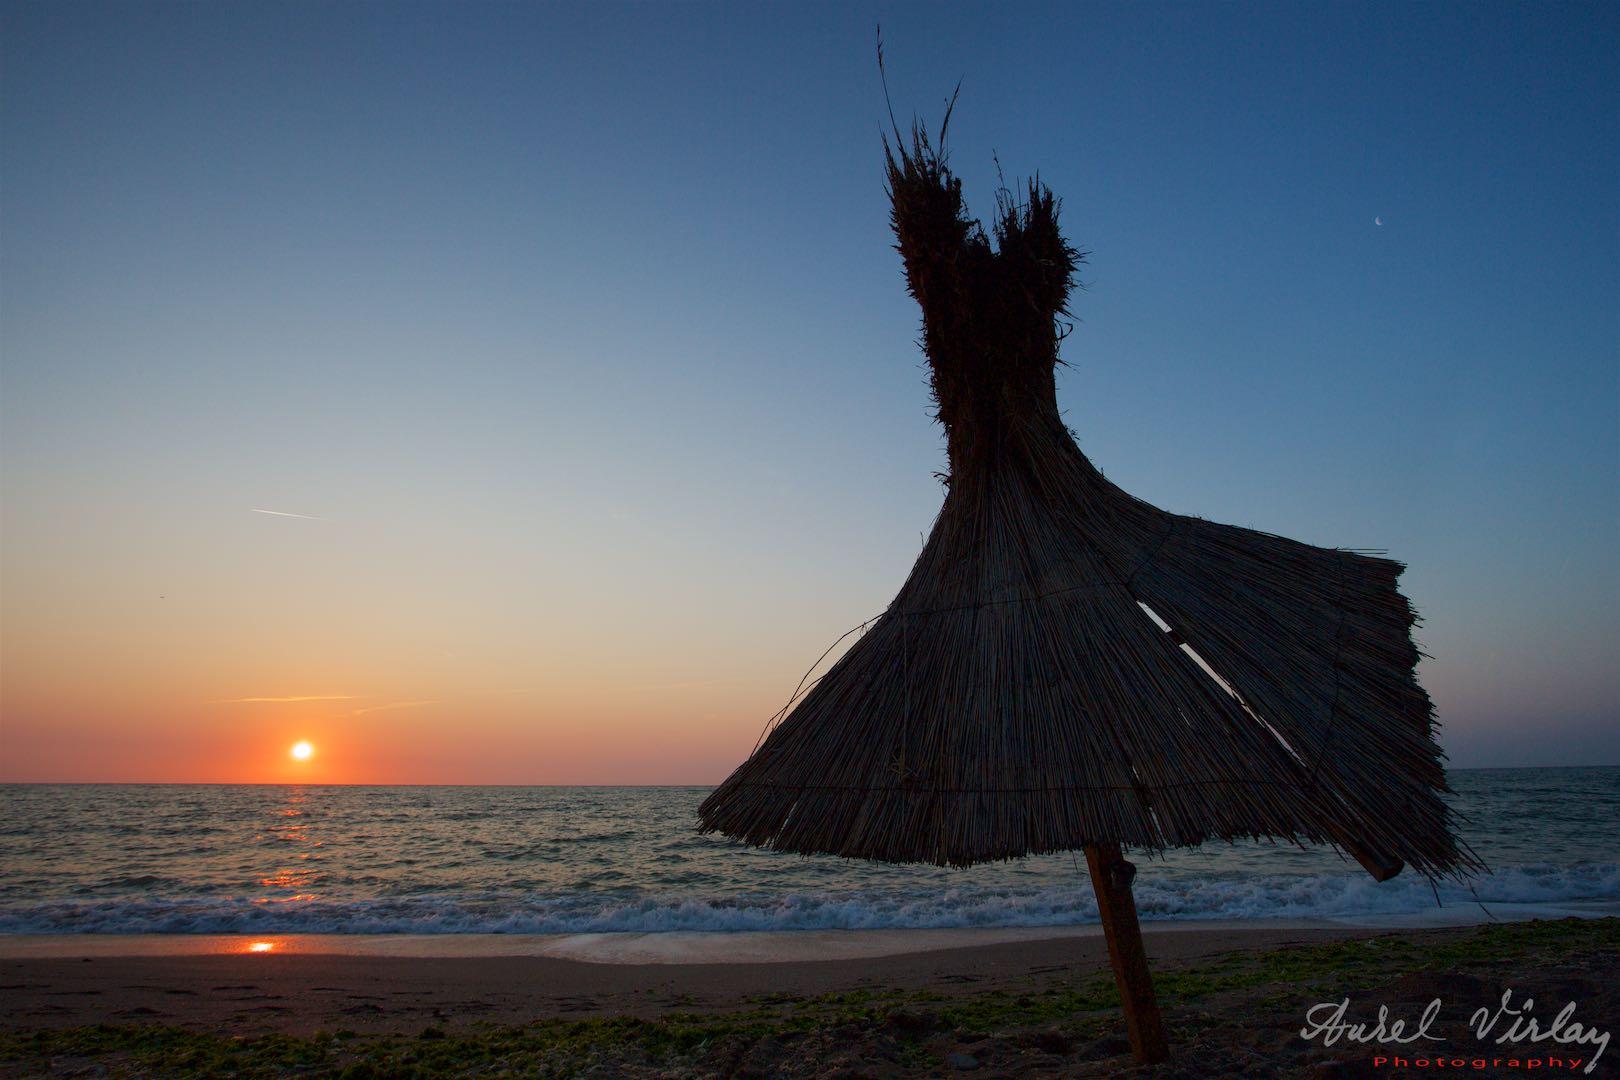 Sunrise umbrella on *Beach of Book*